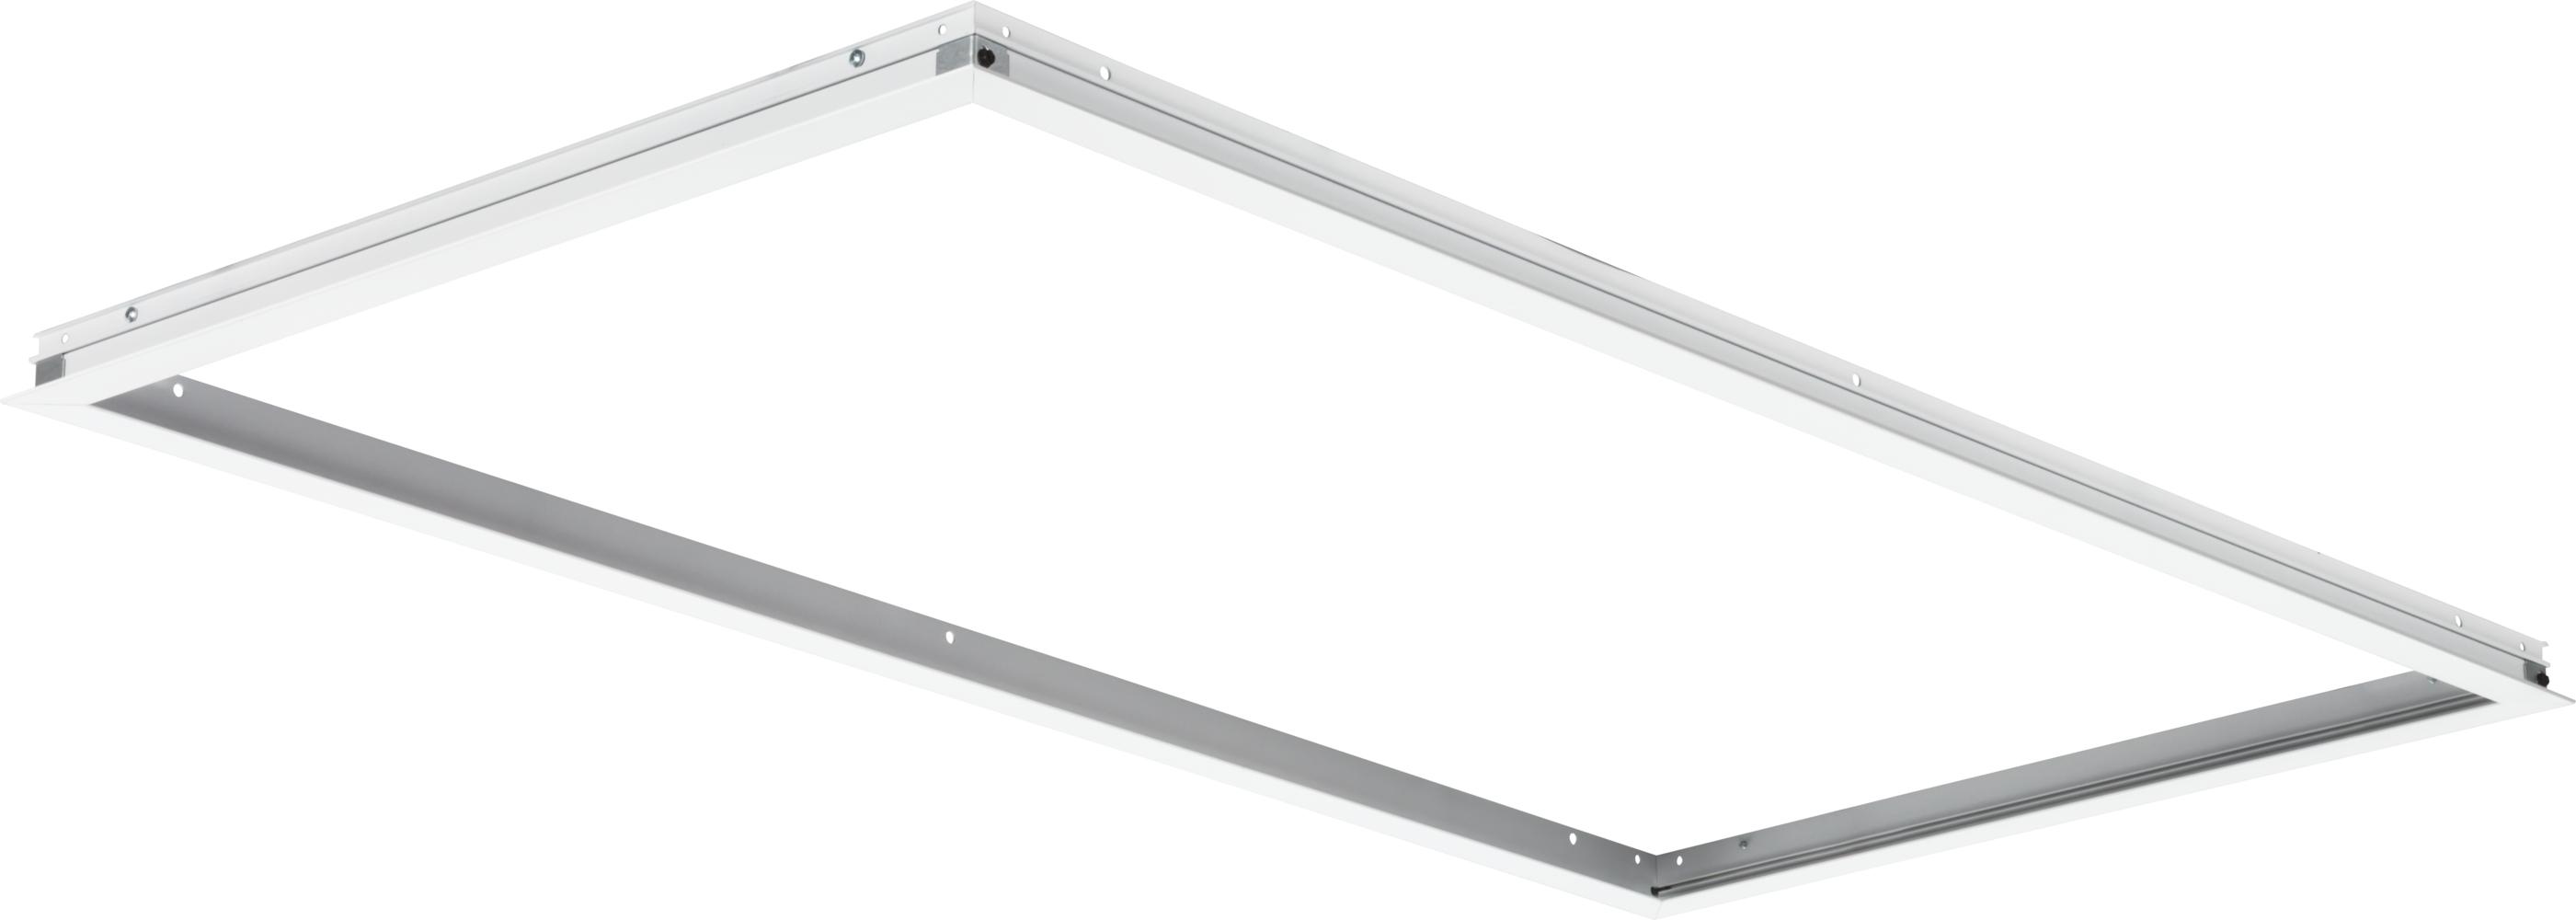 Lithonia Lighting® DGA24